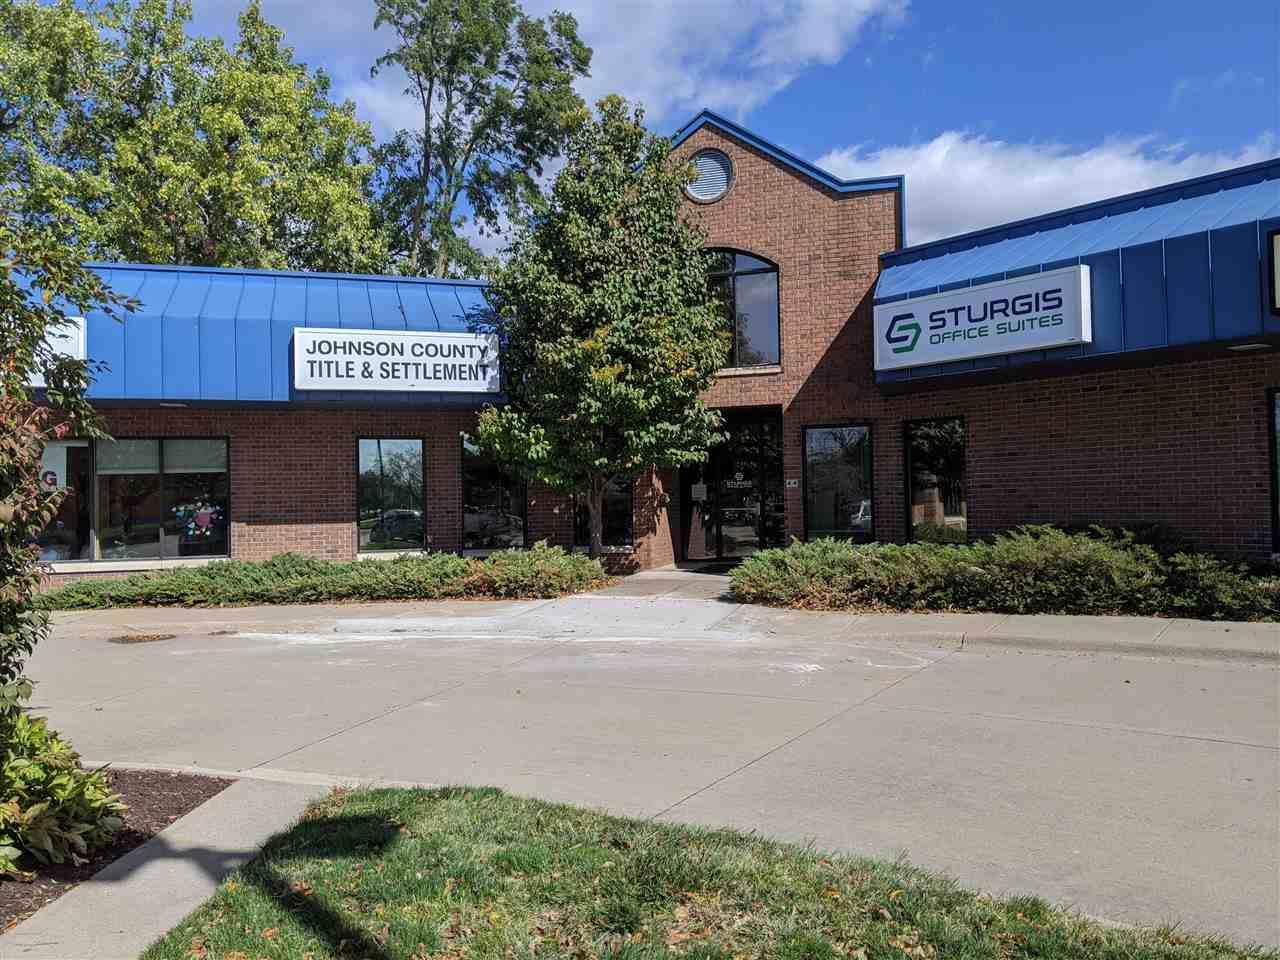 44 Sturgis Corner Dr. - Photo 1